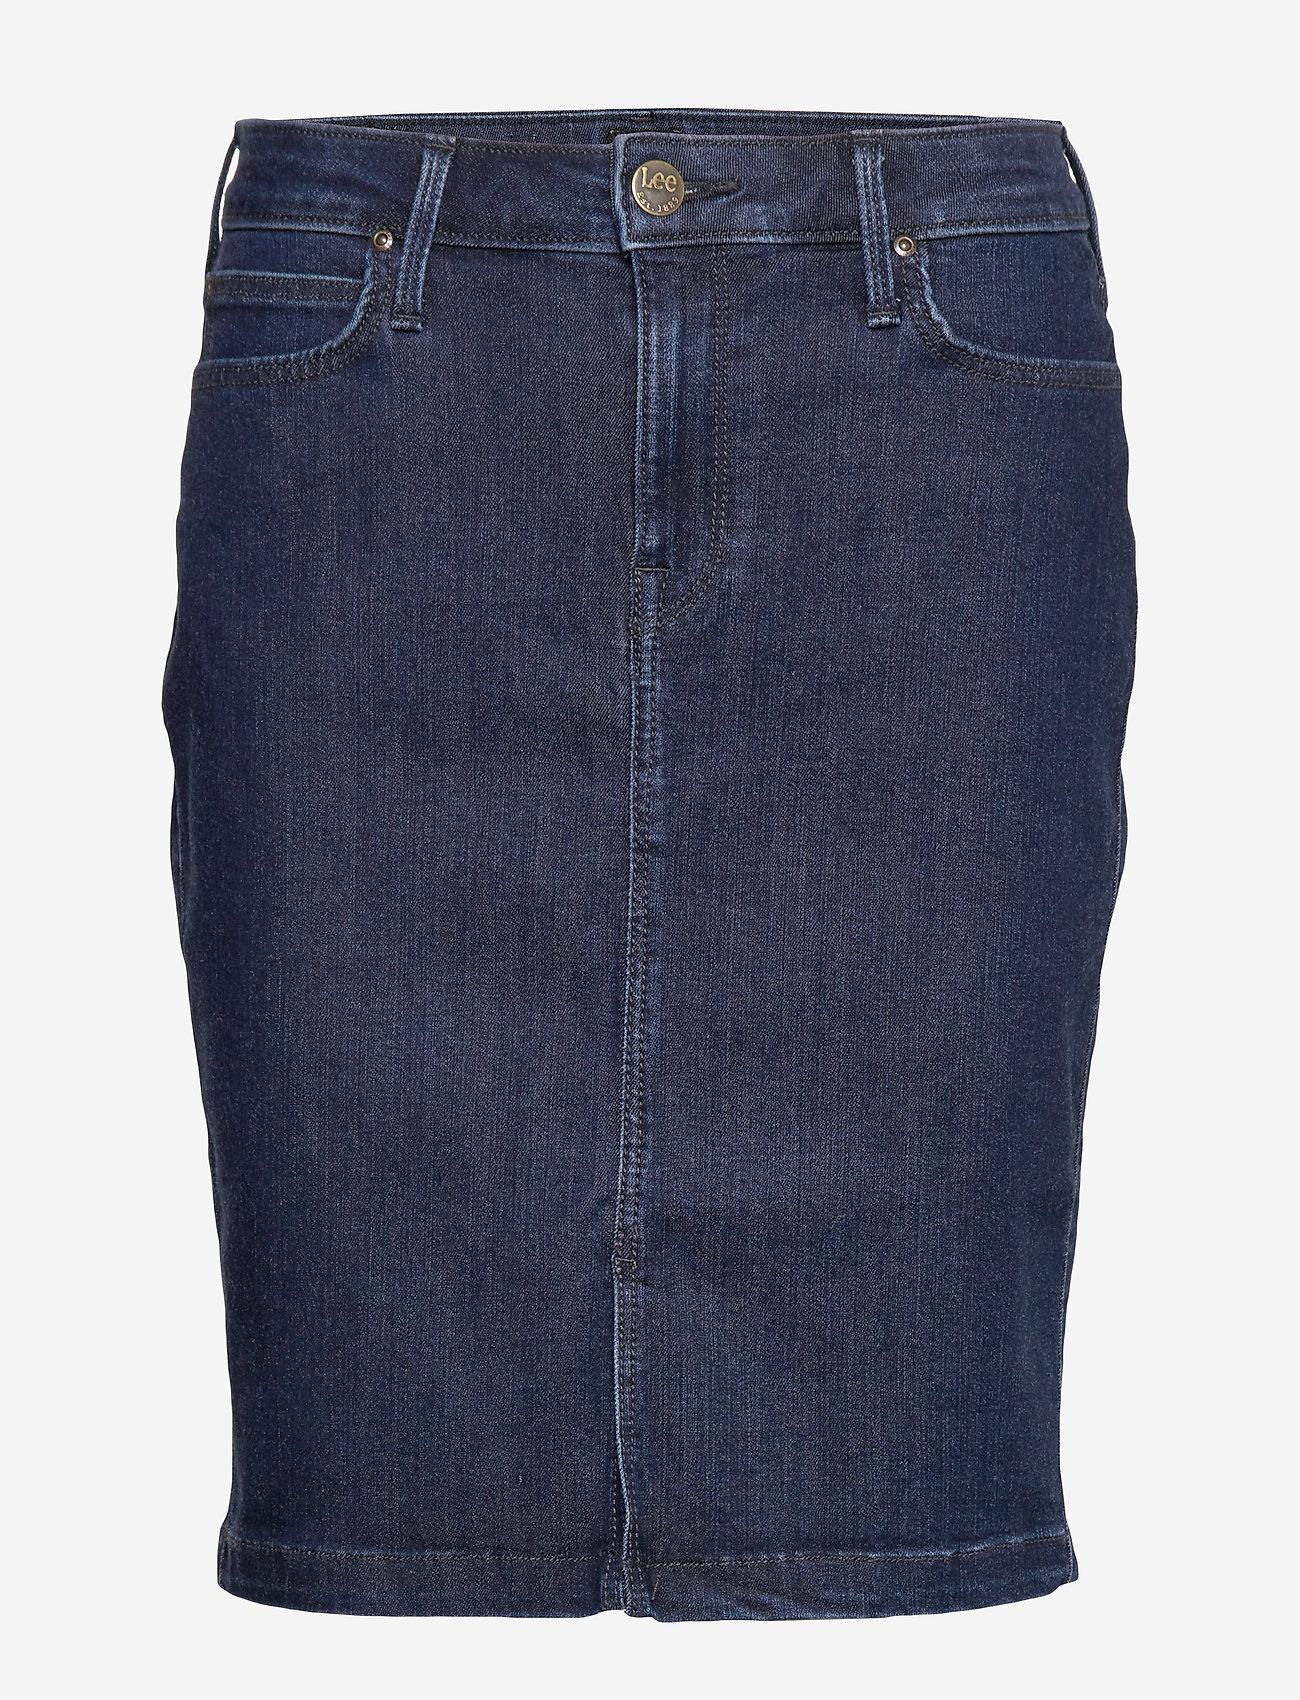 Lee Jeans - SKIRT - jeansowe spódnice - tonal stonewash - 1